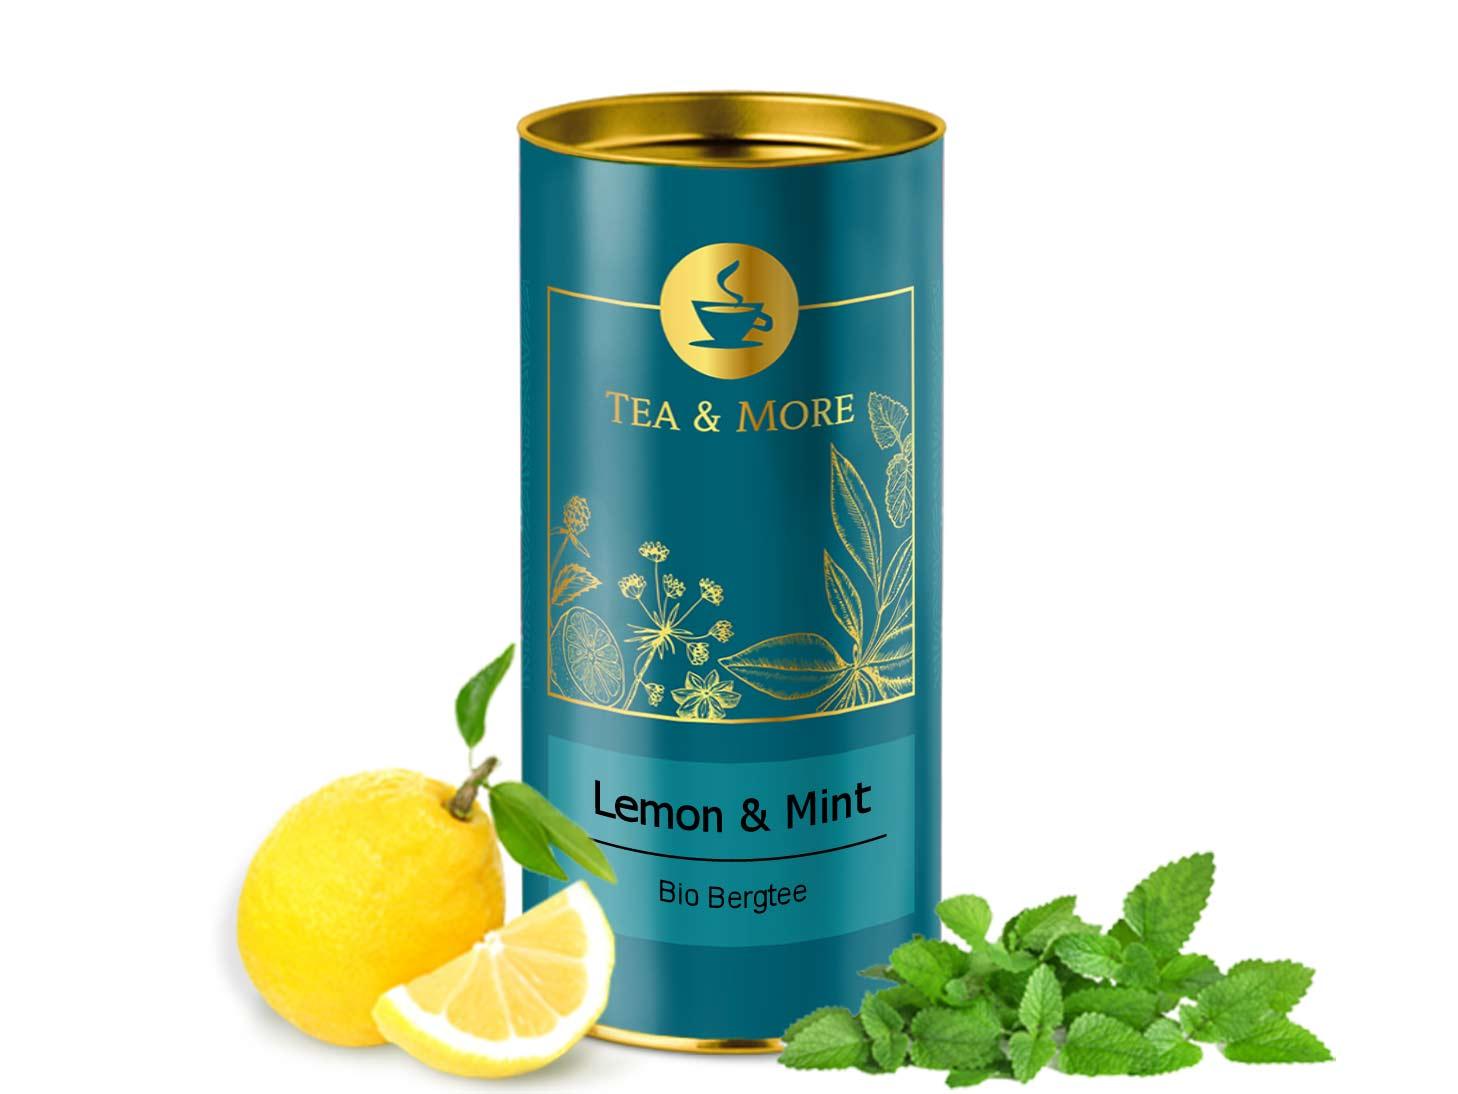 Bergtee, Lemon & Minze (Bio)